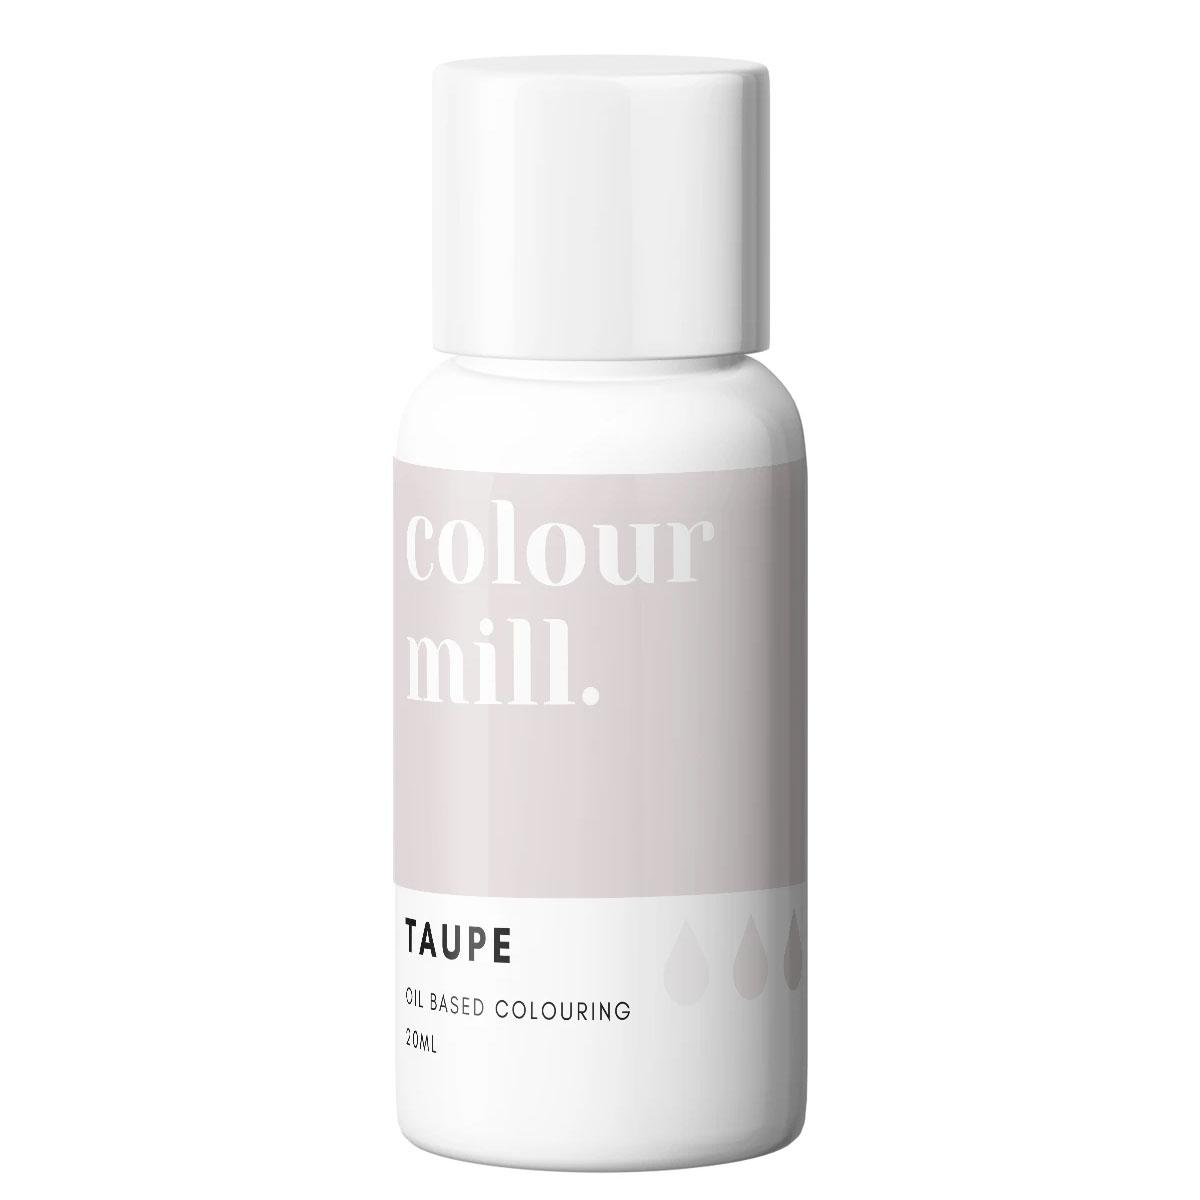 Colour Mill fettlösliche Lebensmittelfarbe - Taupe 20ml